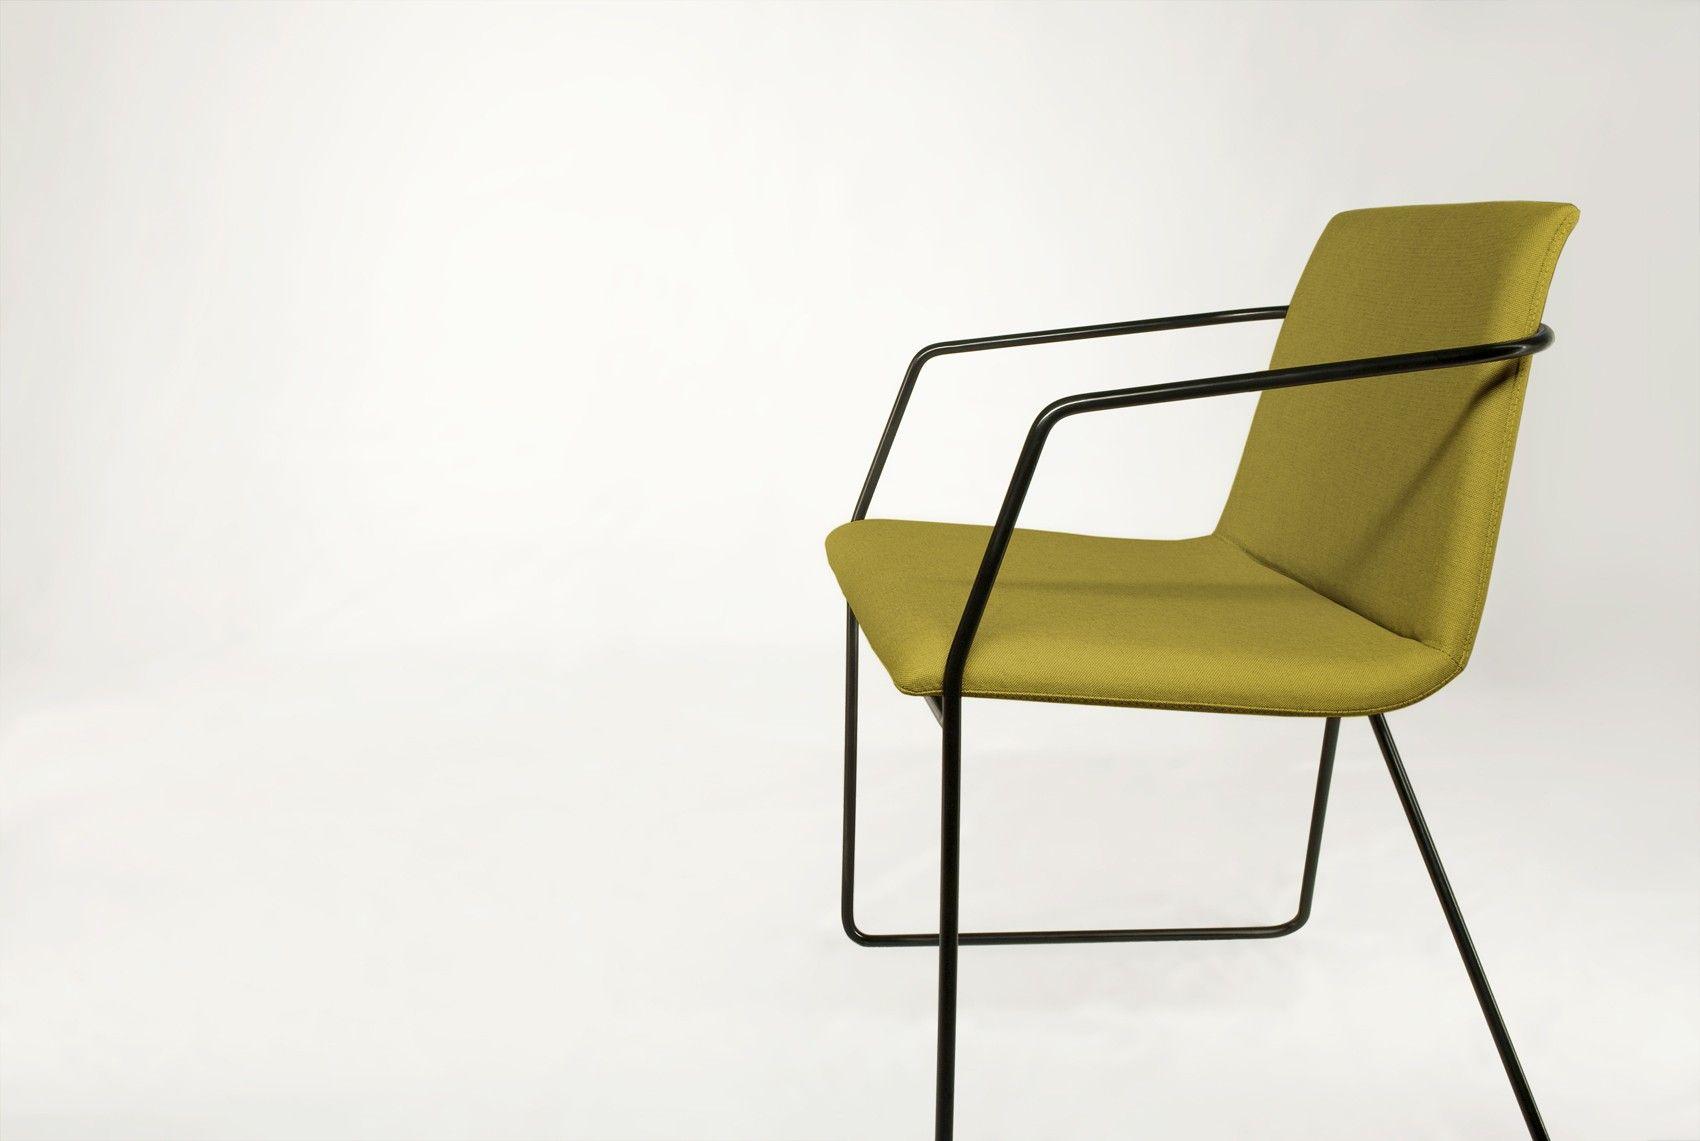 Silla Horqueta Sillas Estudio Federico Churba Furniture  # Muebles Federico Churba